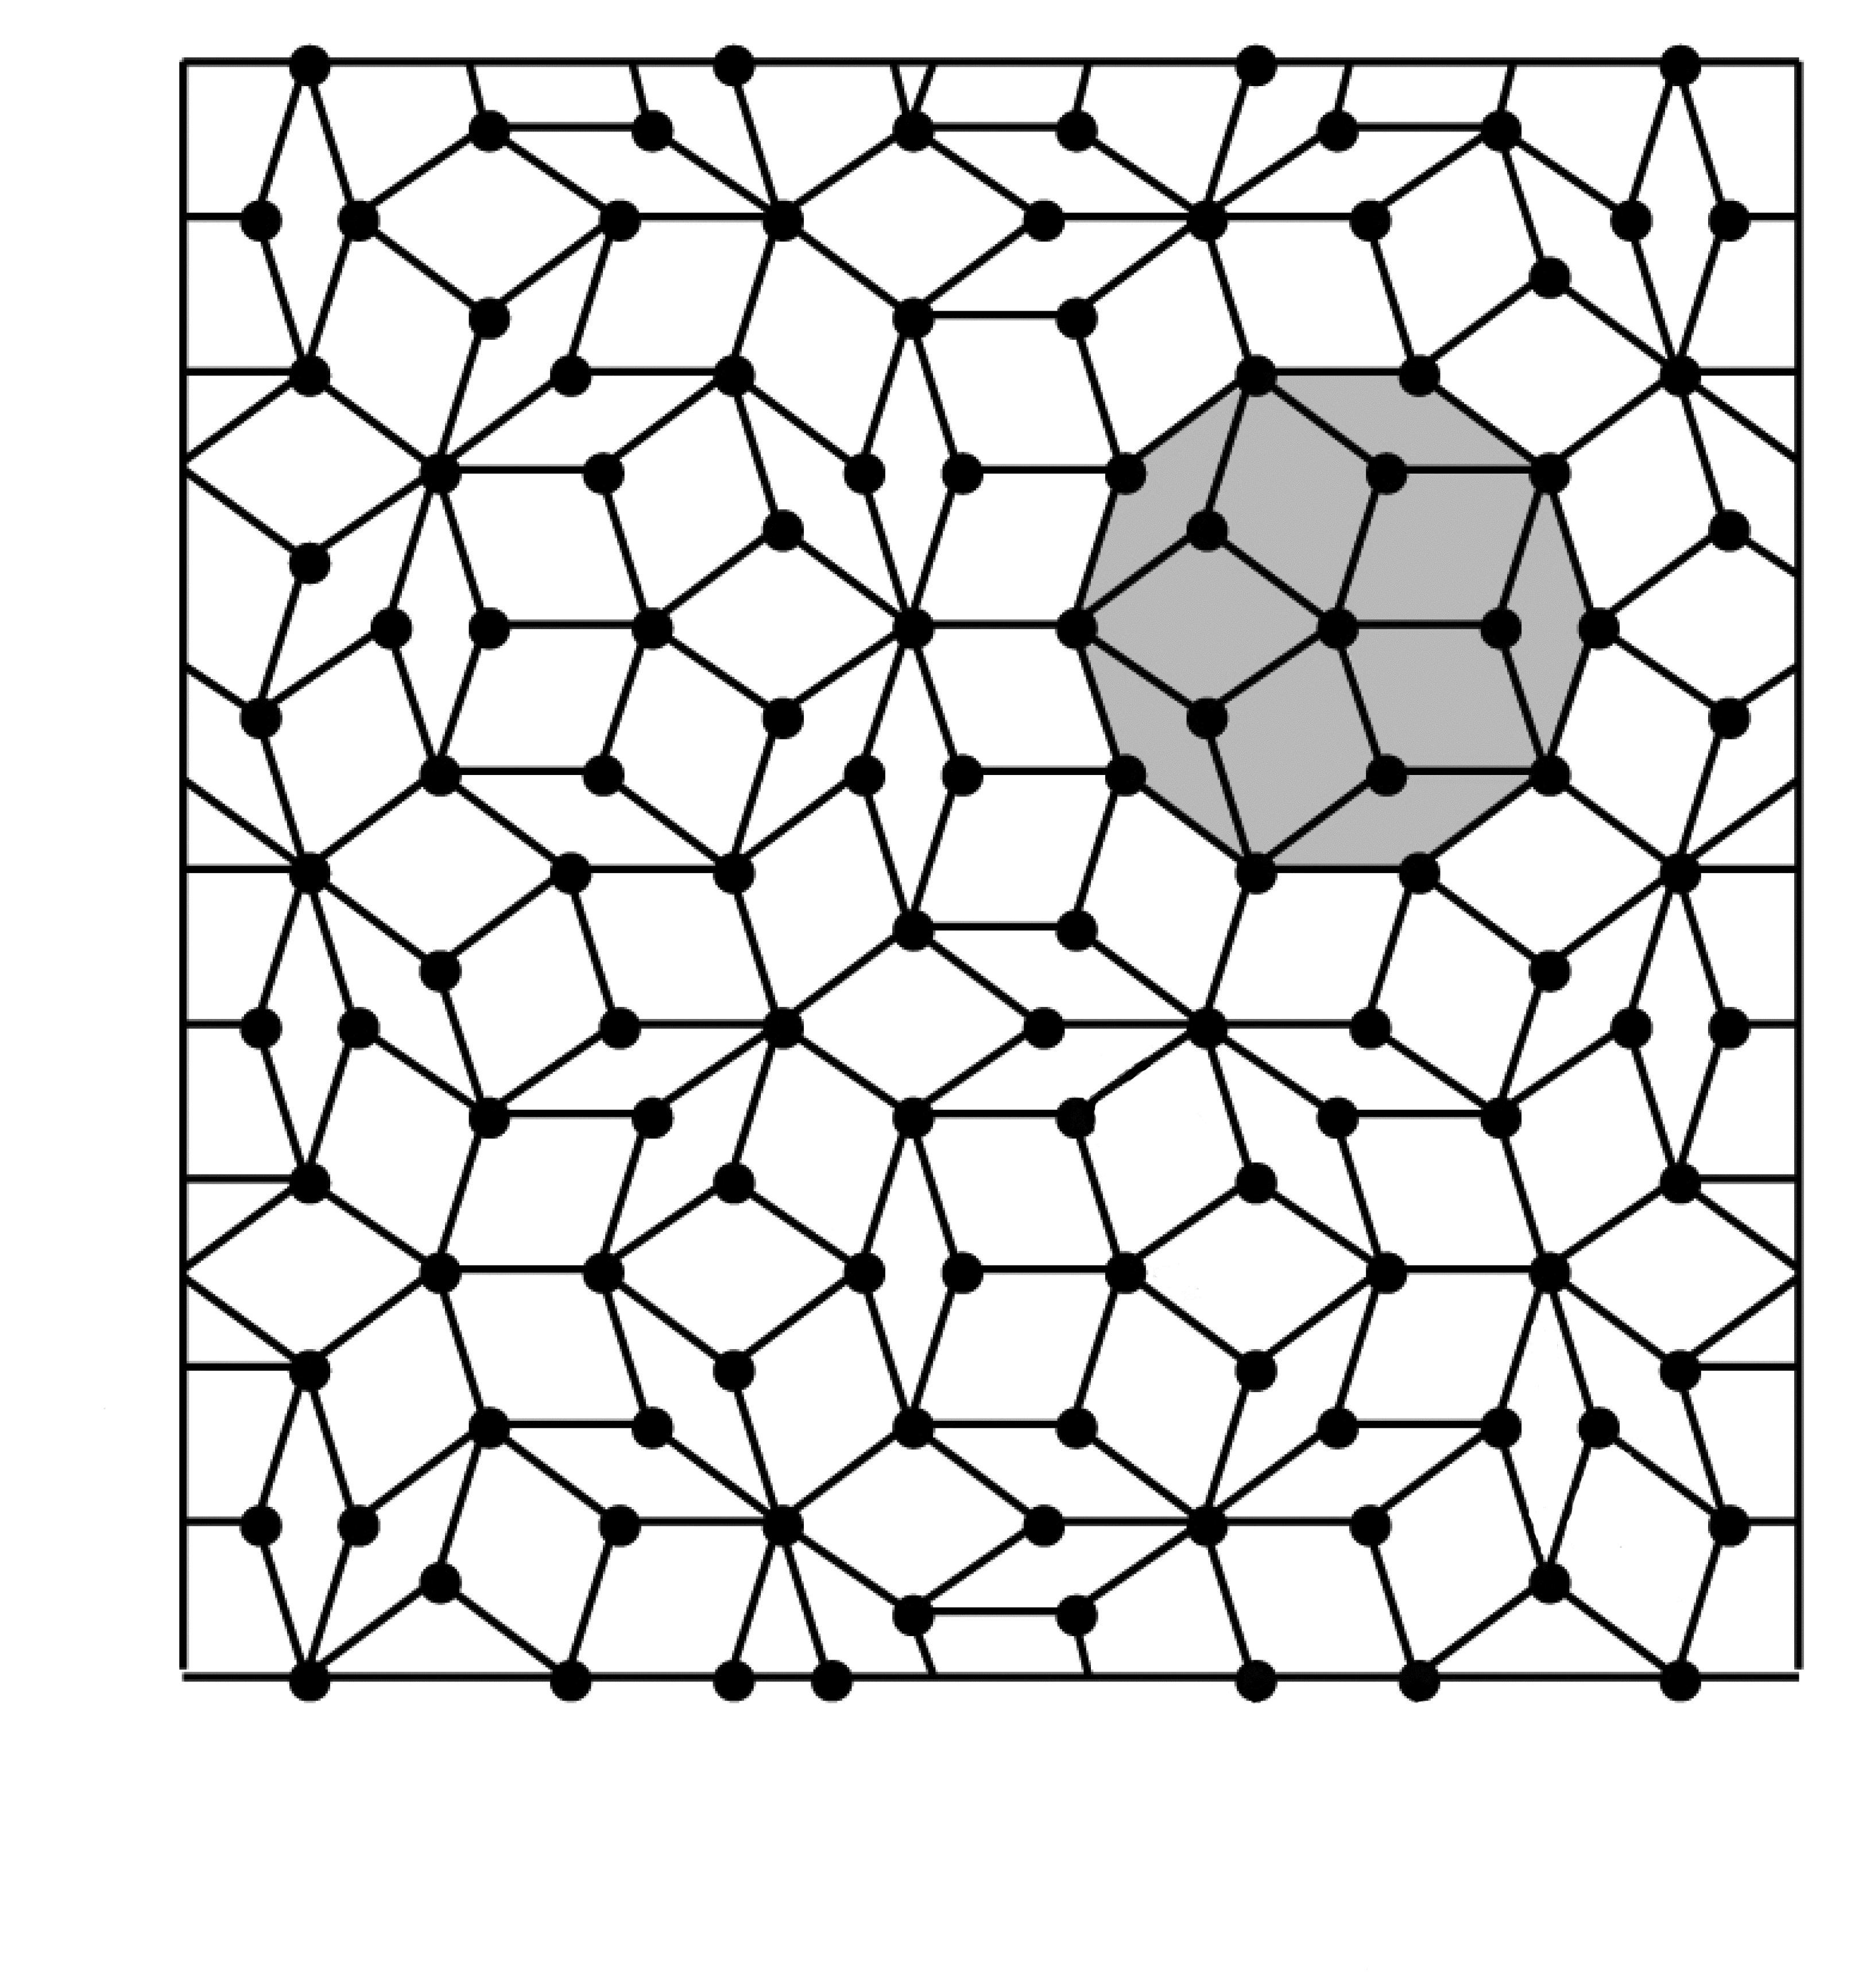 quasicrystal